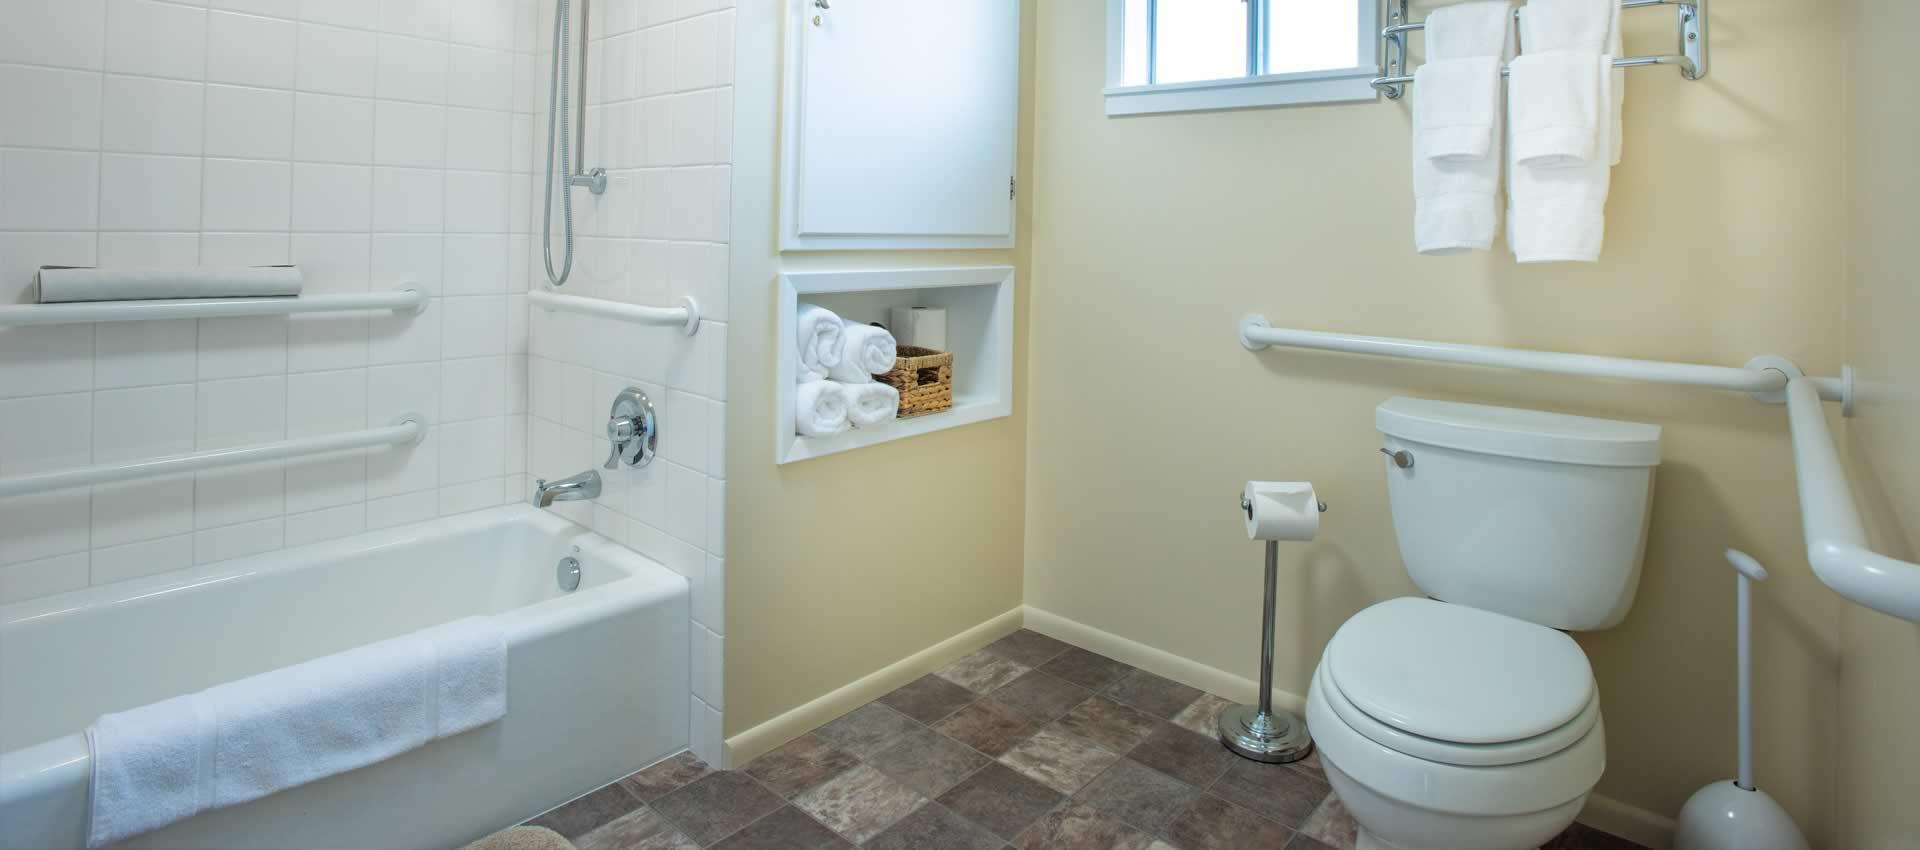 Redwood Suites- ada room bathroom showing the shower